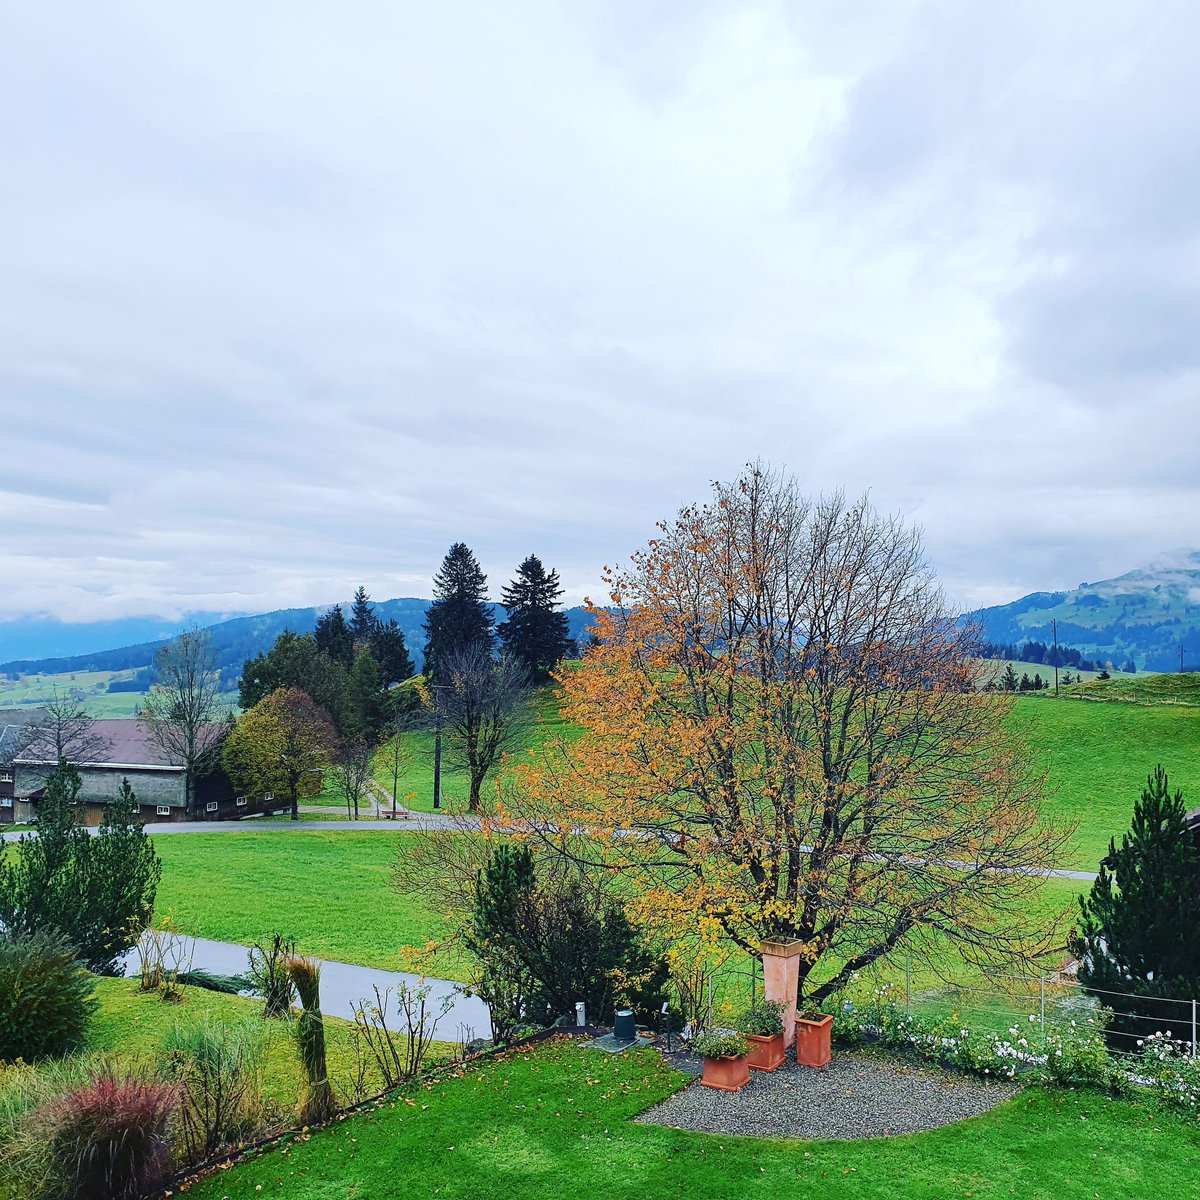 Good morning... #brenden #swissmeteo #appenzell #alpstein #switzerland #pfeffermintze #brendianer #likethatview #goodmorningpost #newday #landscapephotography #prettysky #ortderliebe #ortderlust @srfmeteo https://t.co/YYQBvkvgRZ